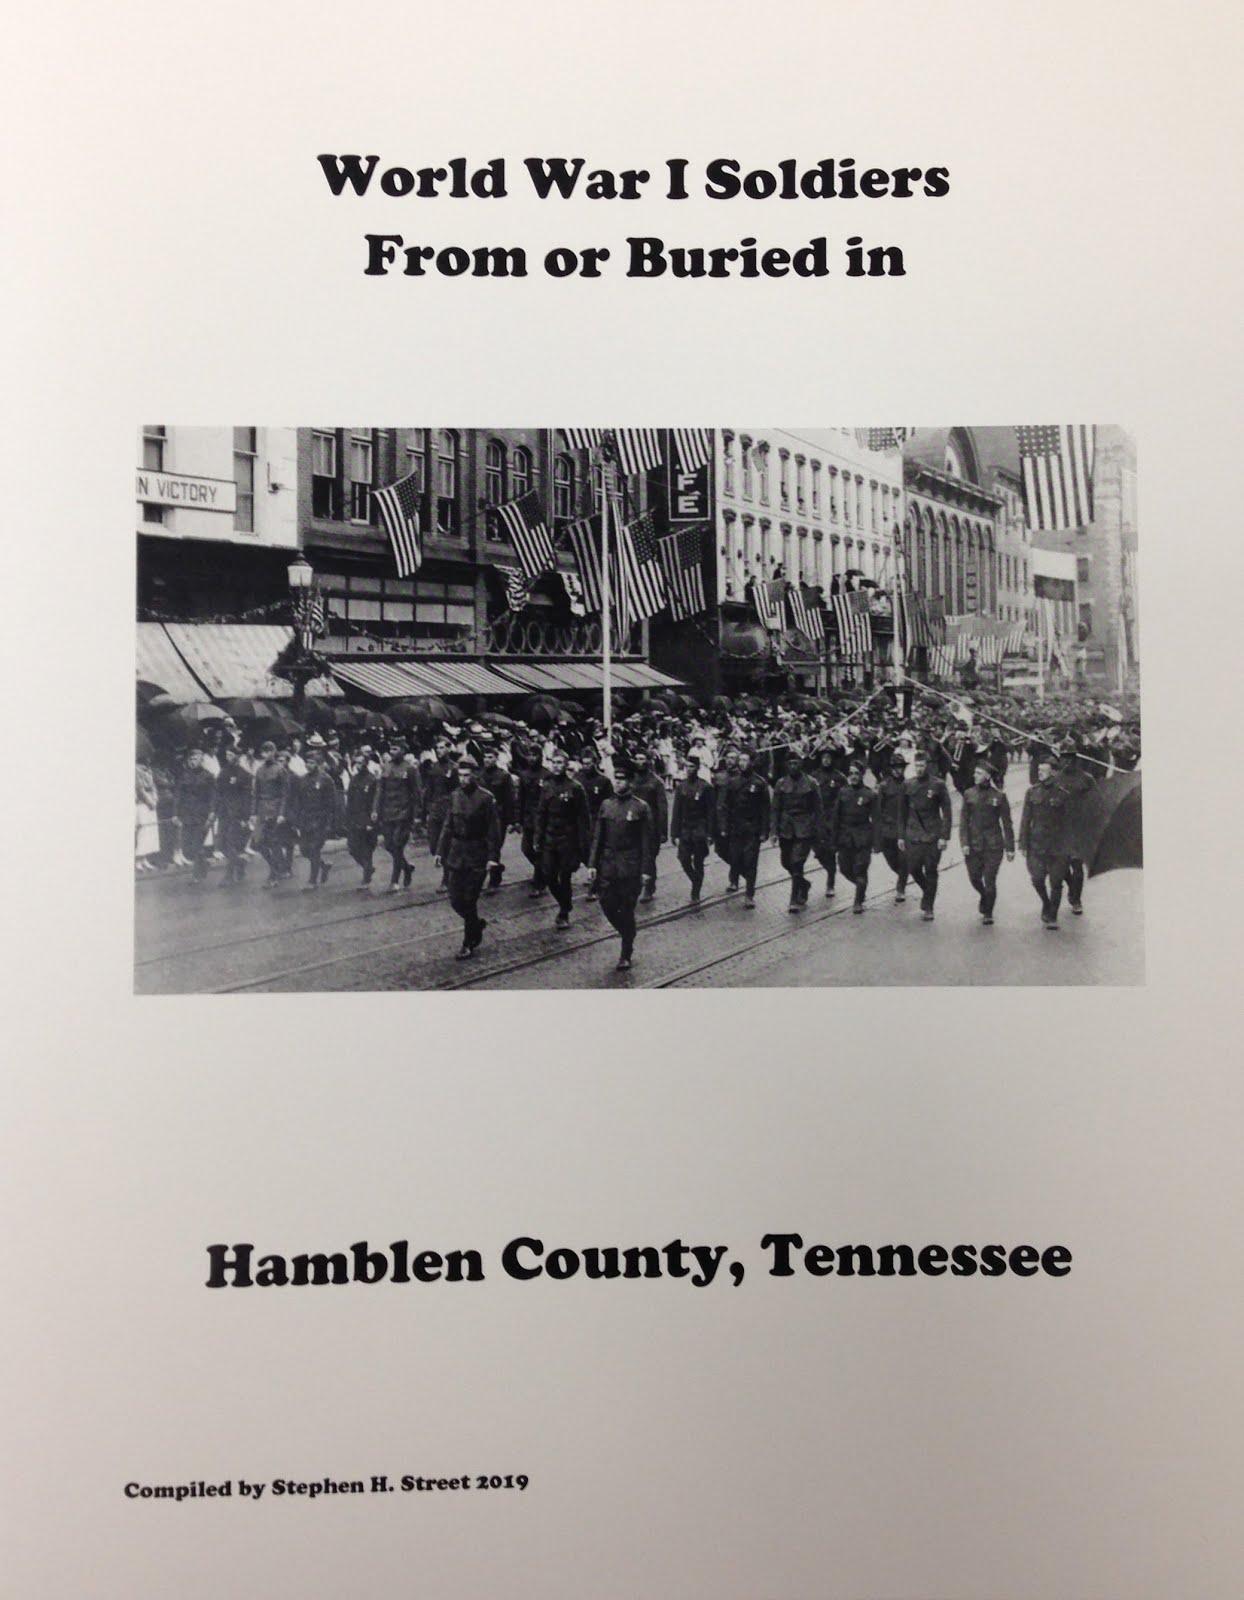 Hamblen County Archives